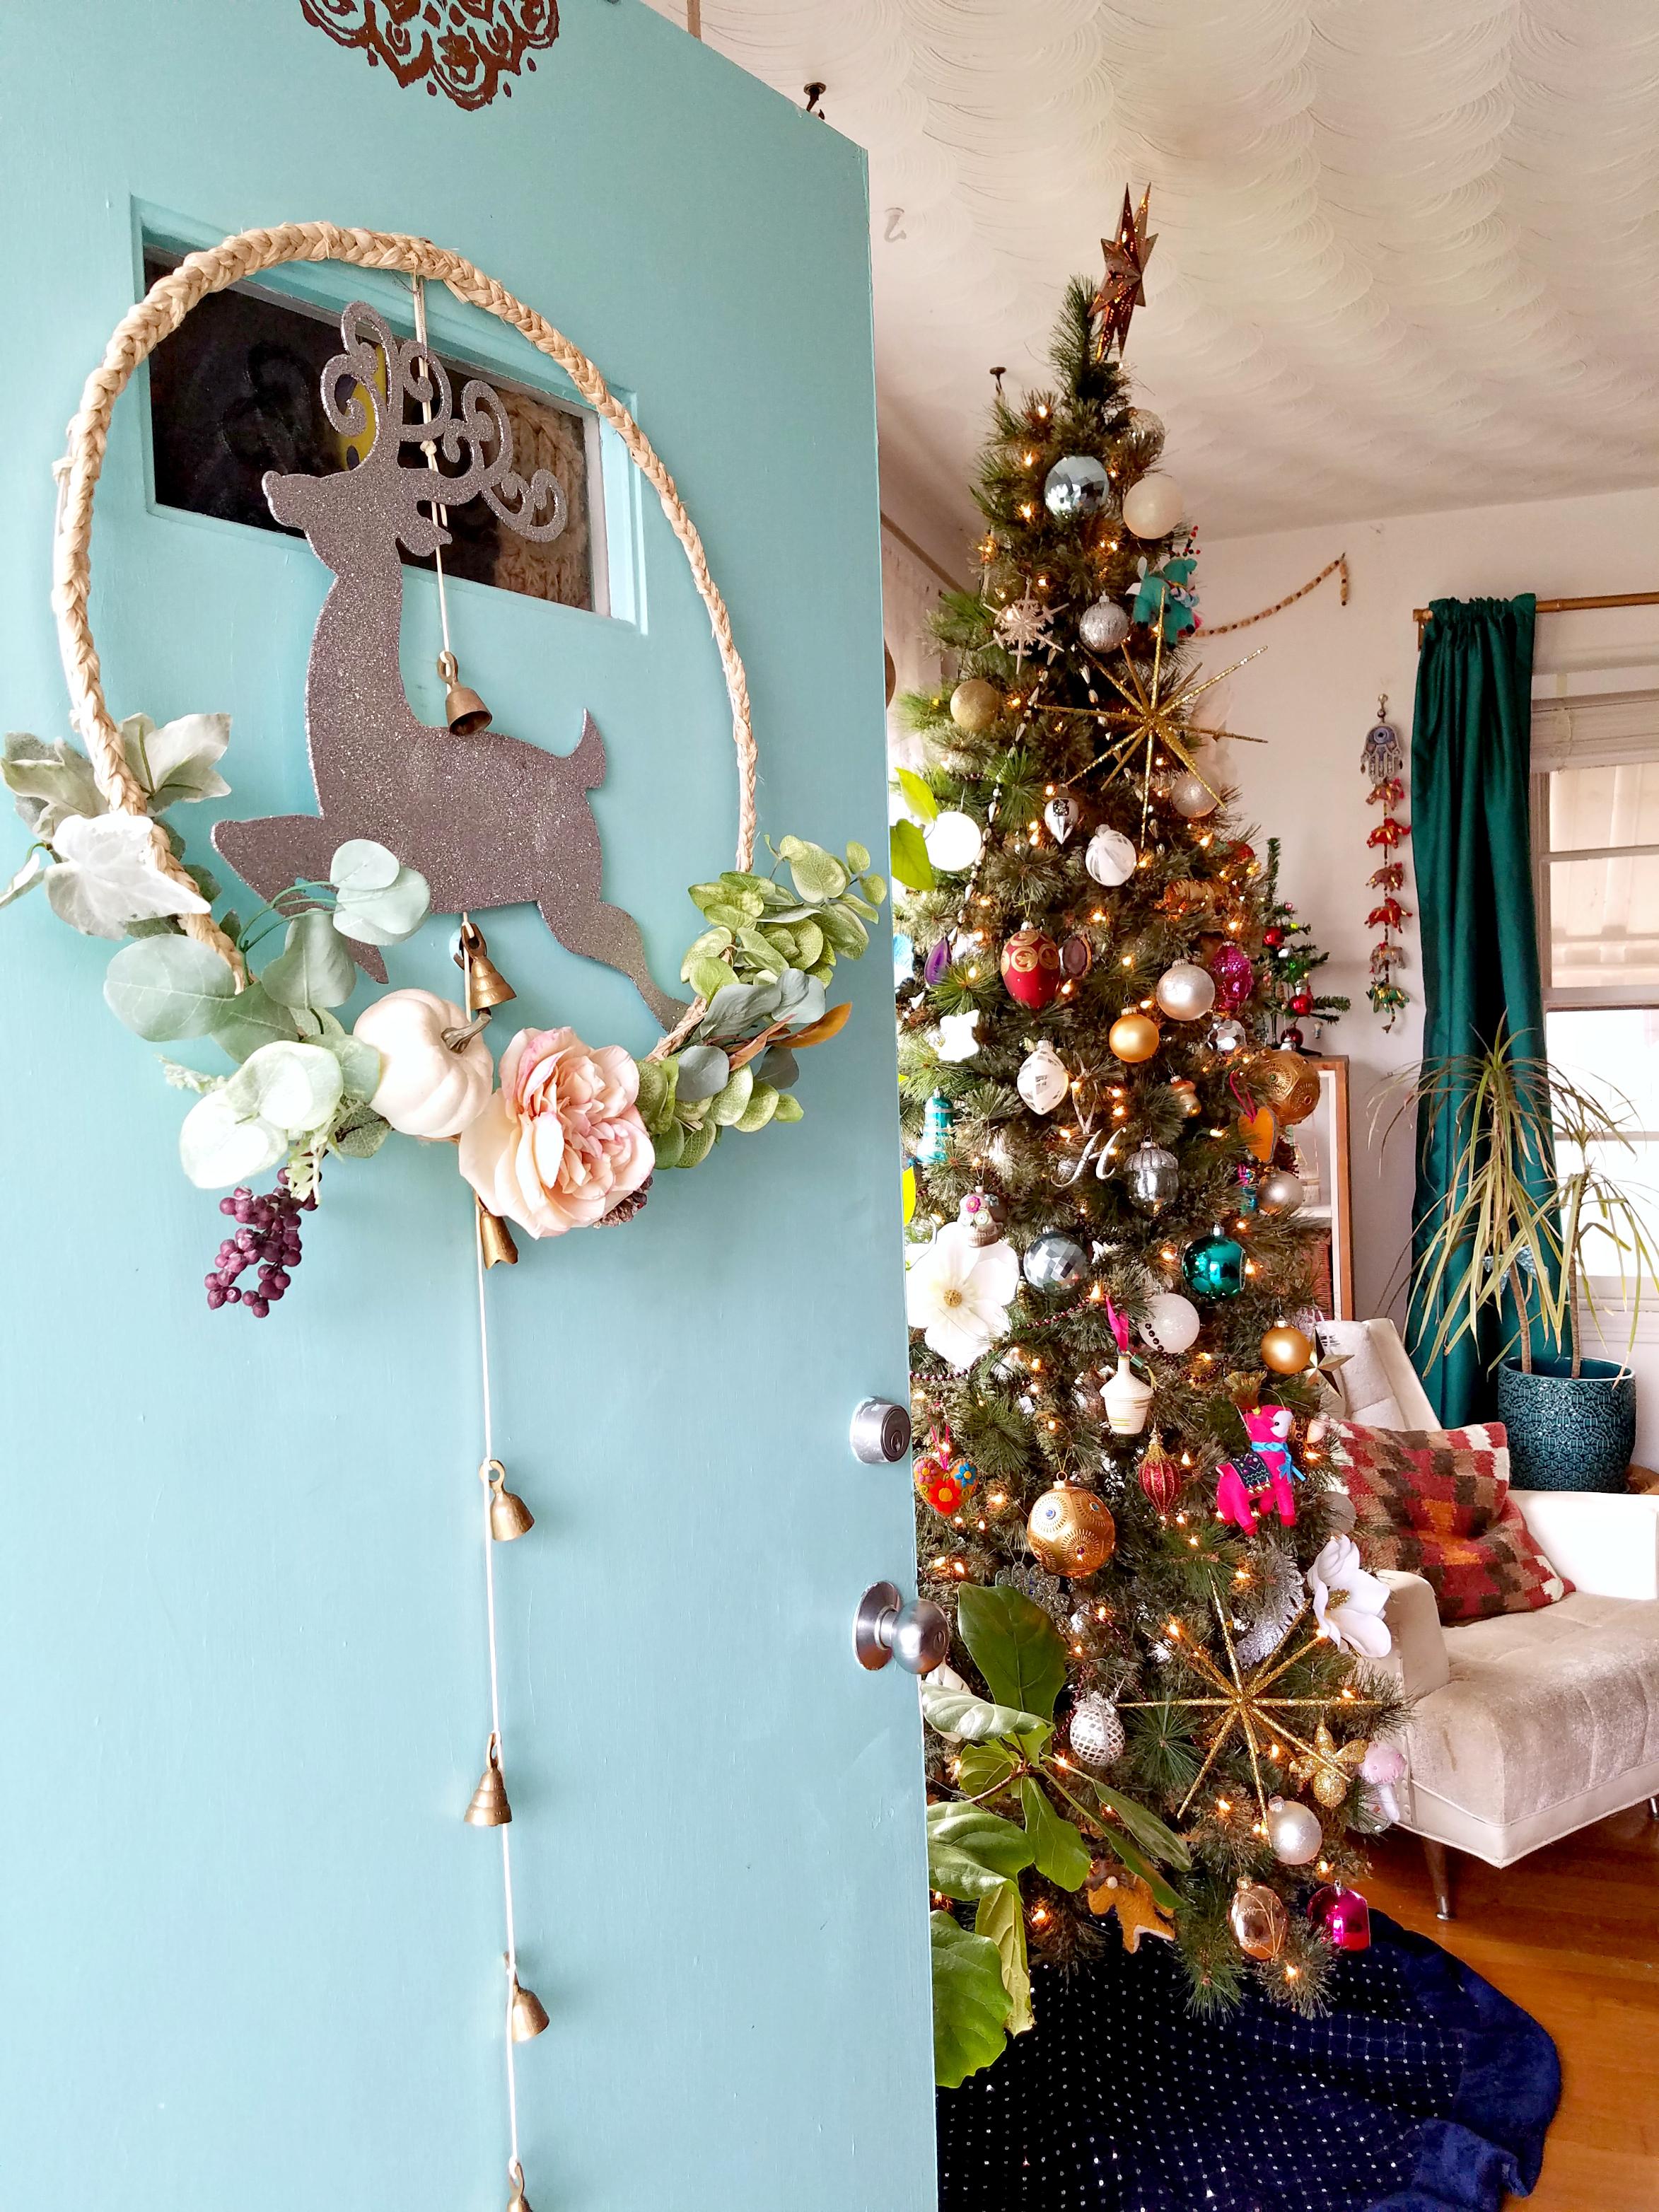 Bohemian Christmas Decorated Front Door